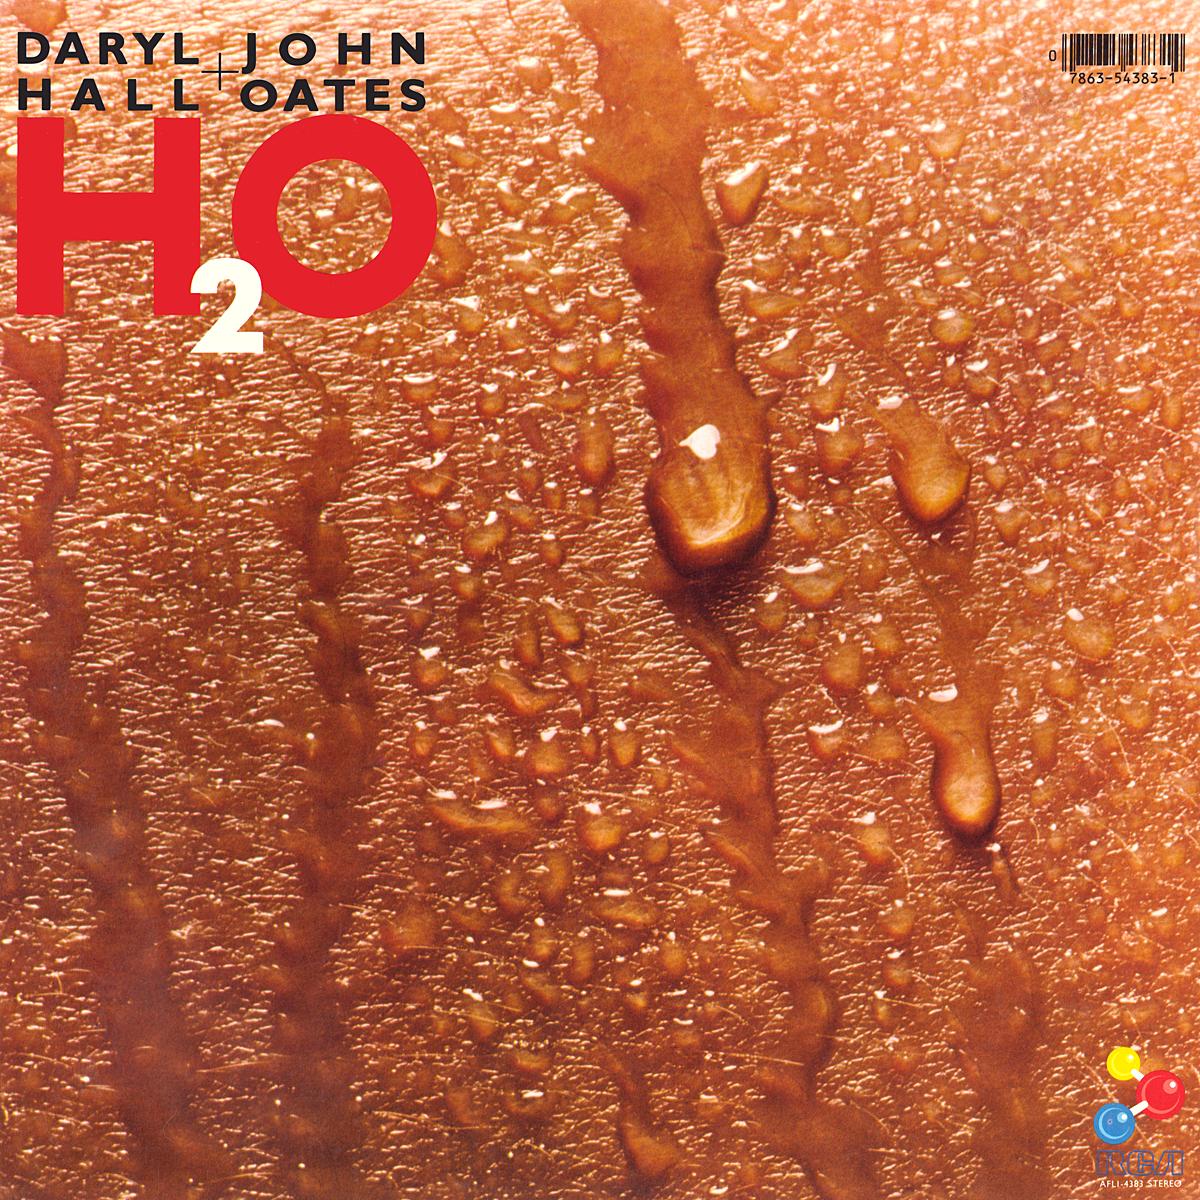 Daryl Hall And John Oates H20 Vinyl Album Covers Com